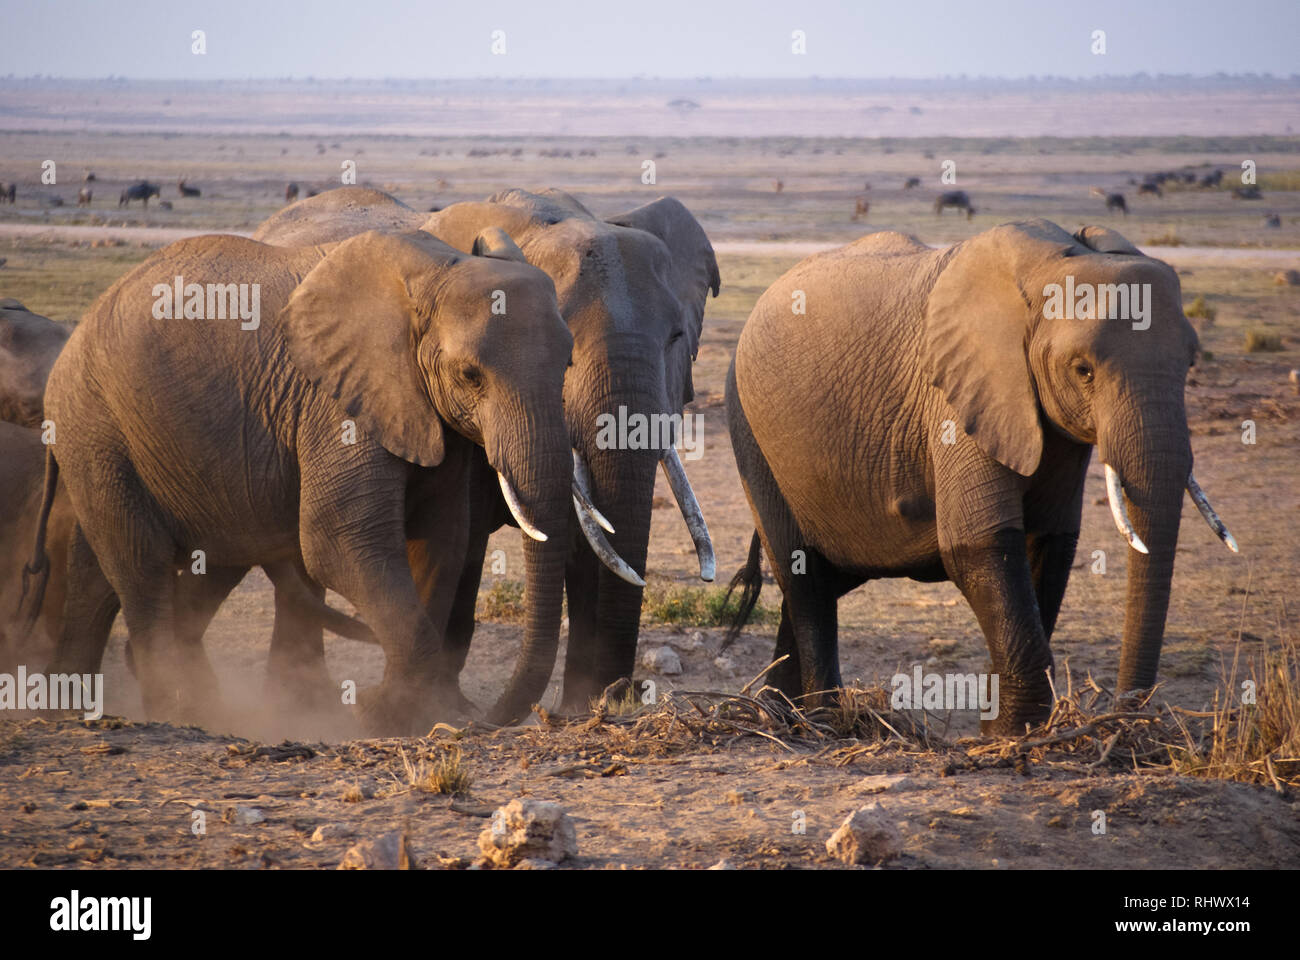 Elephant herd in Amboseli National Park - Stock Image